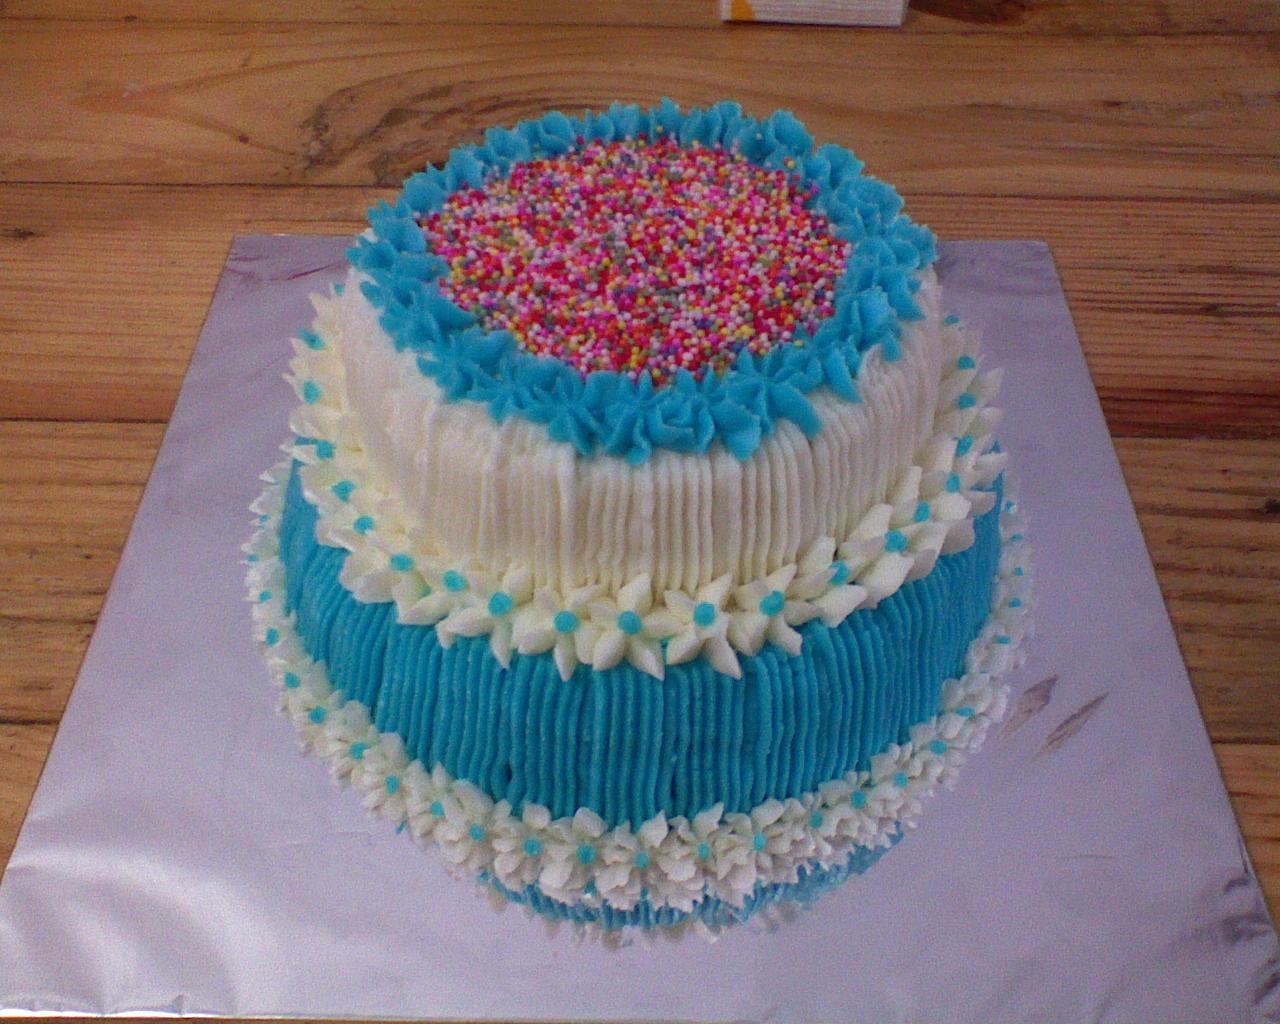 Pin Kue Ultah Fondant Mamayo Halaman 6 Cake On Pinterest